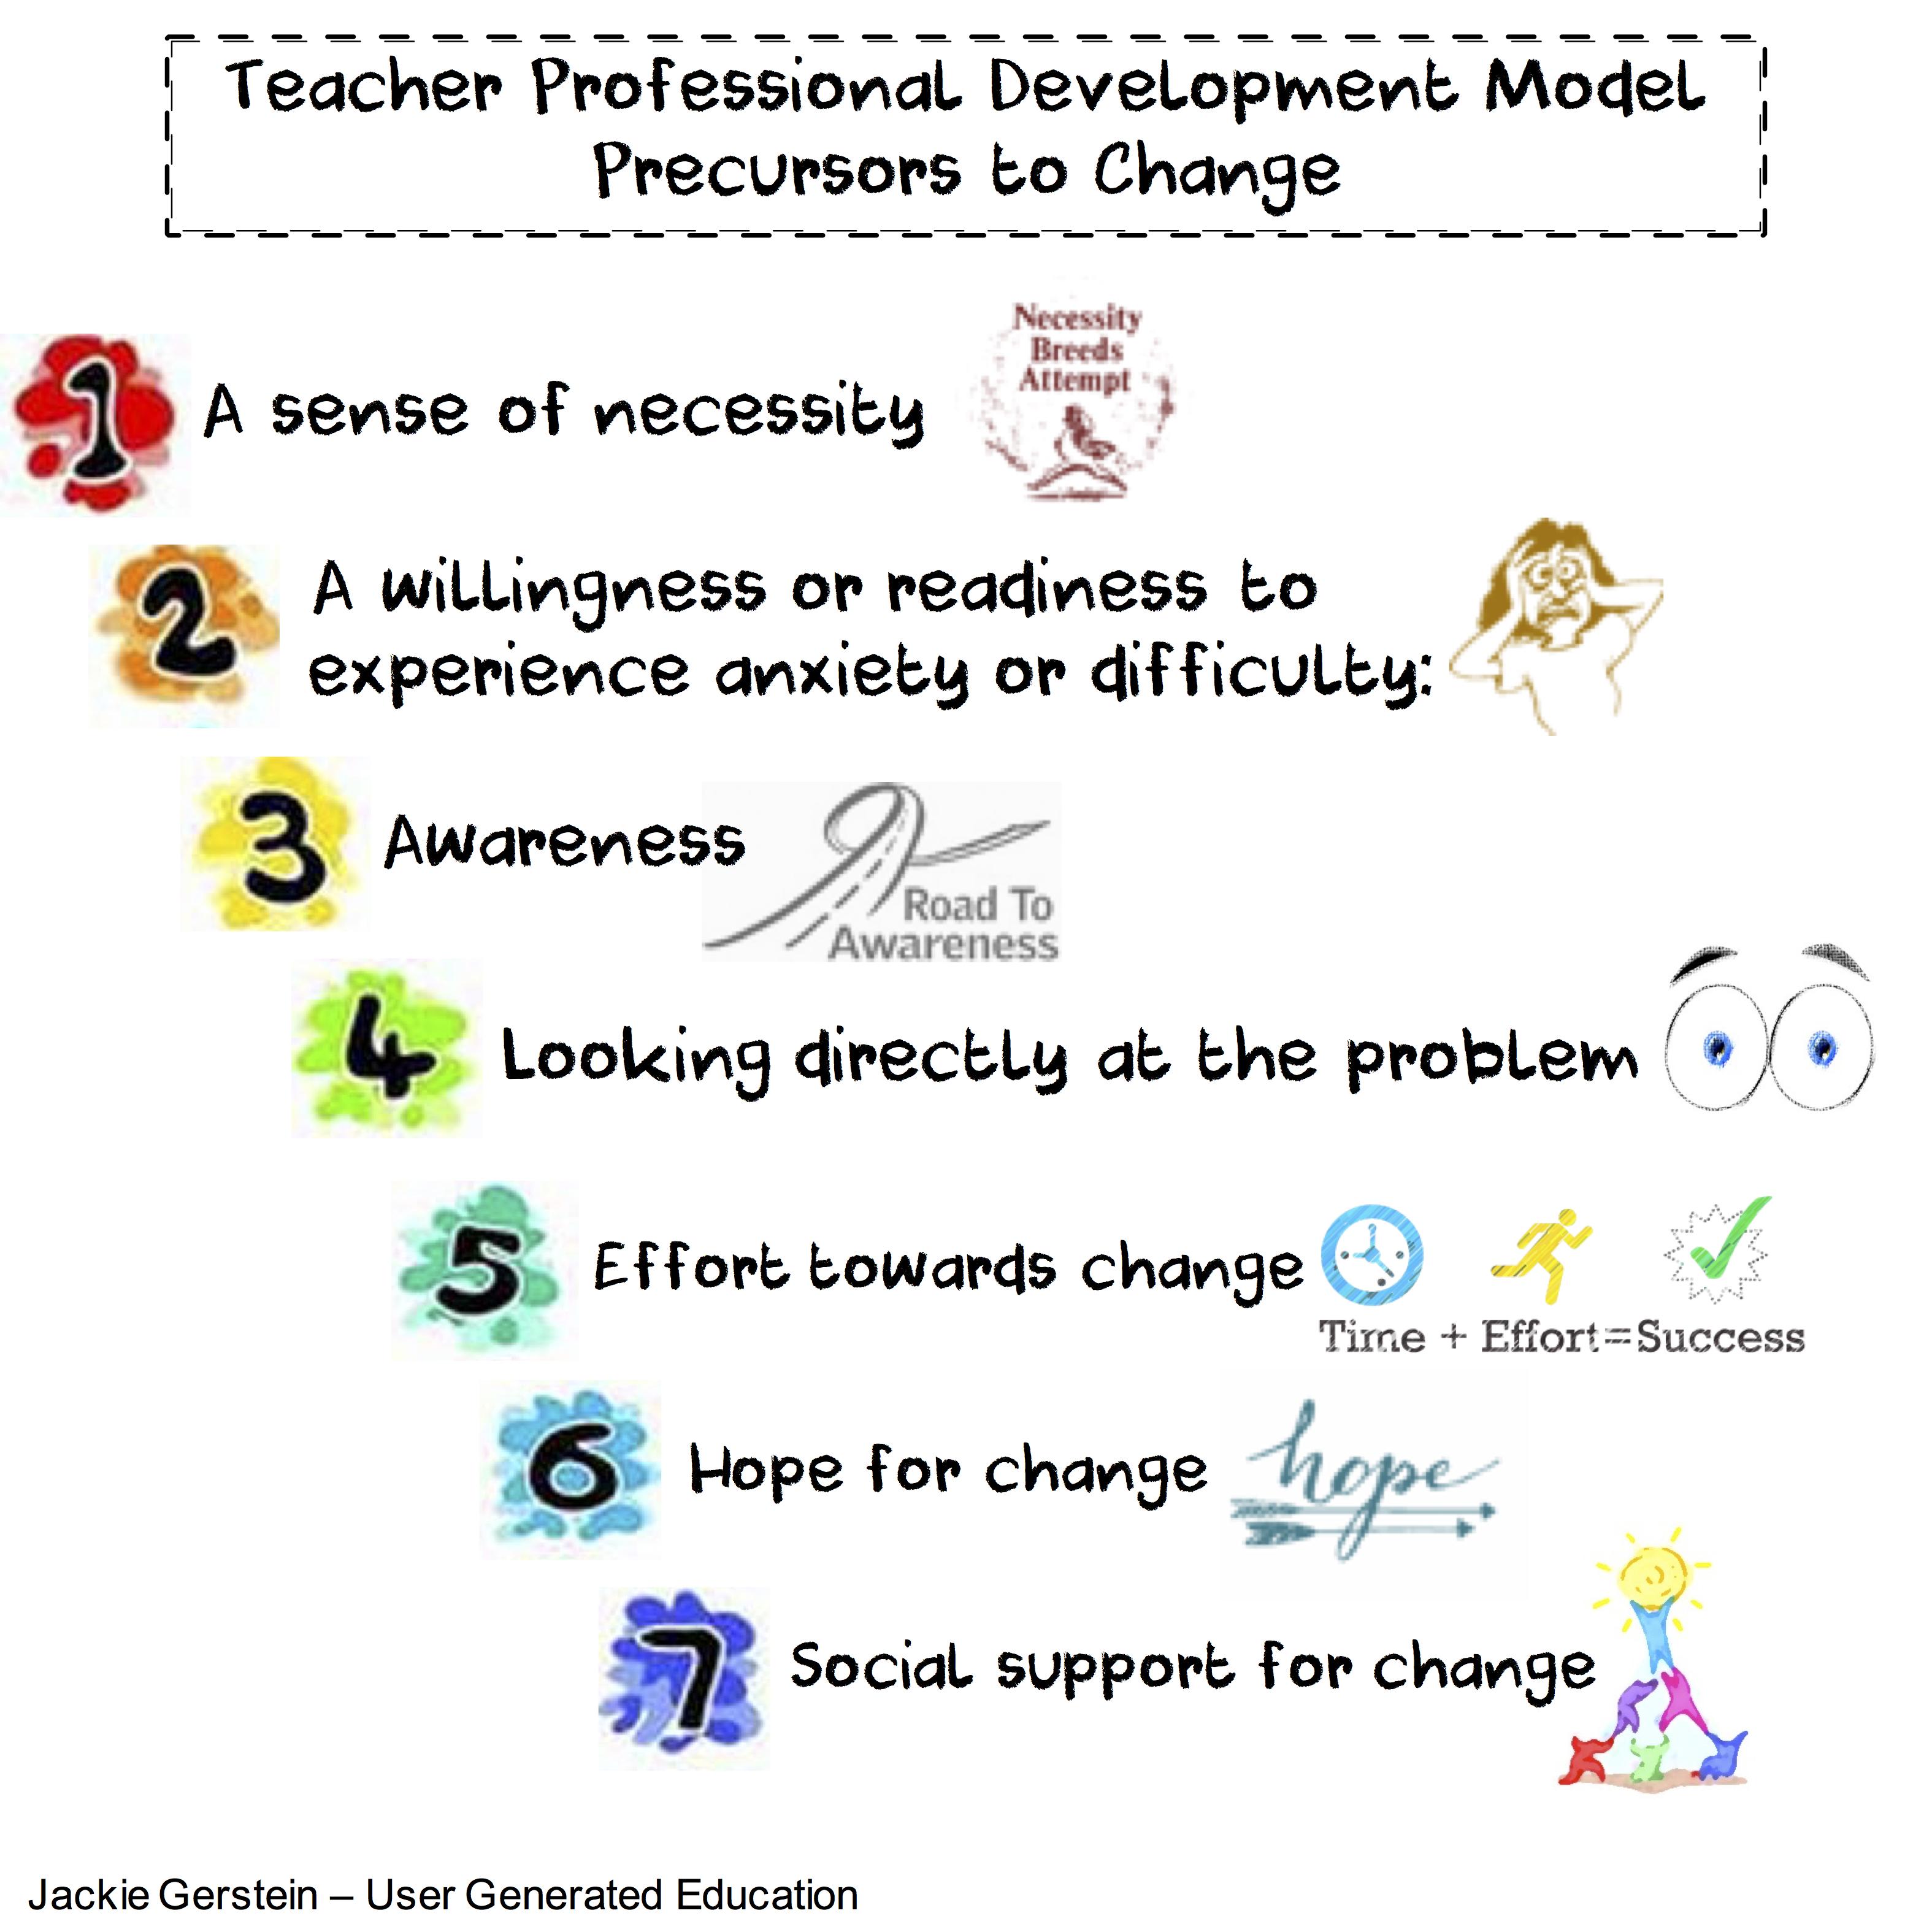 A Model For Teacher Development Precursors To Change